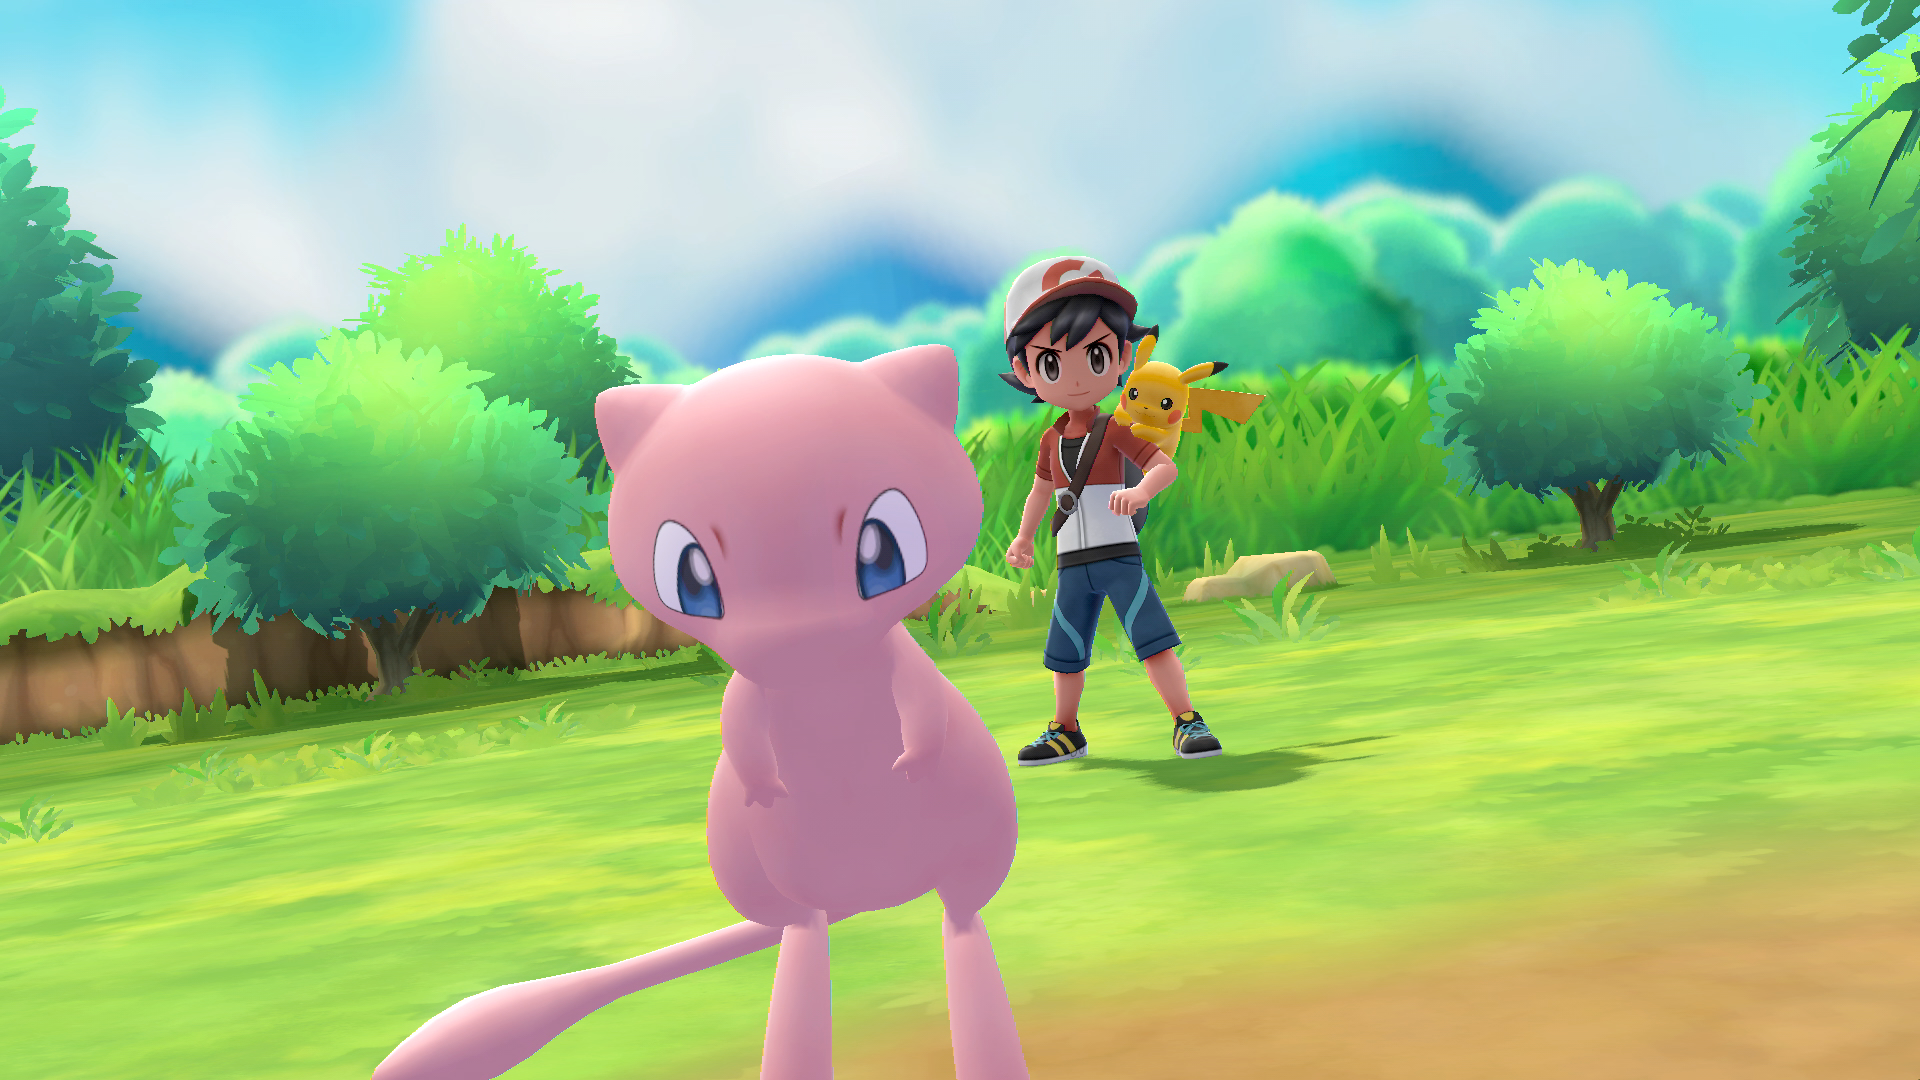 Mew Pokémon Let's Go